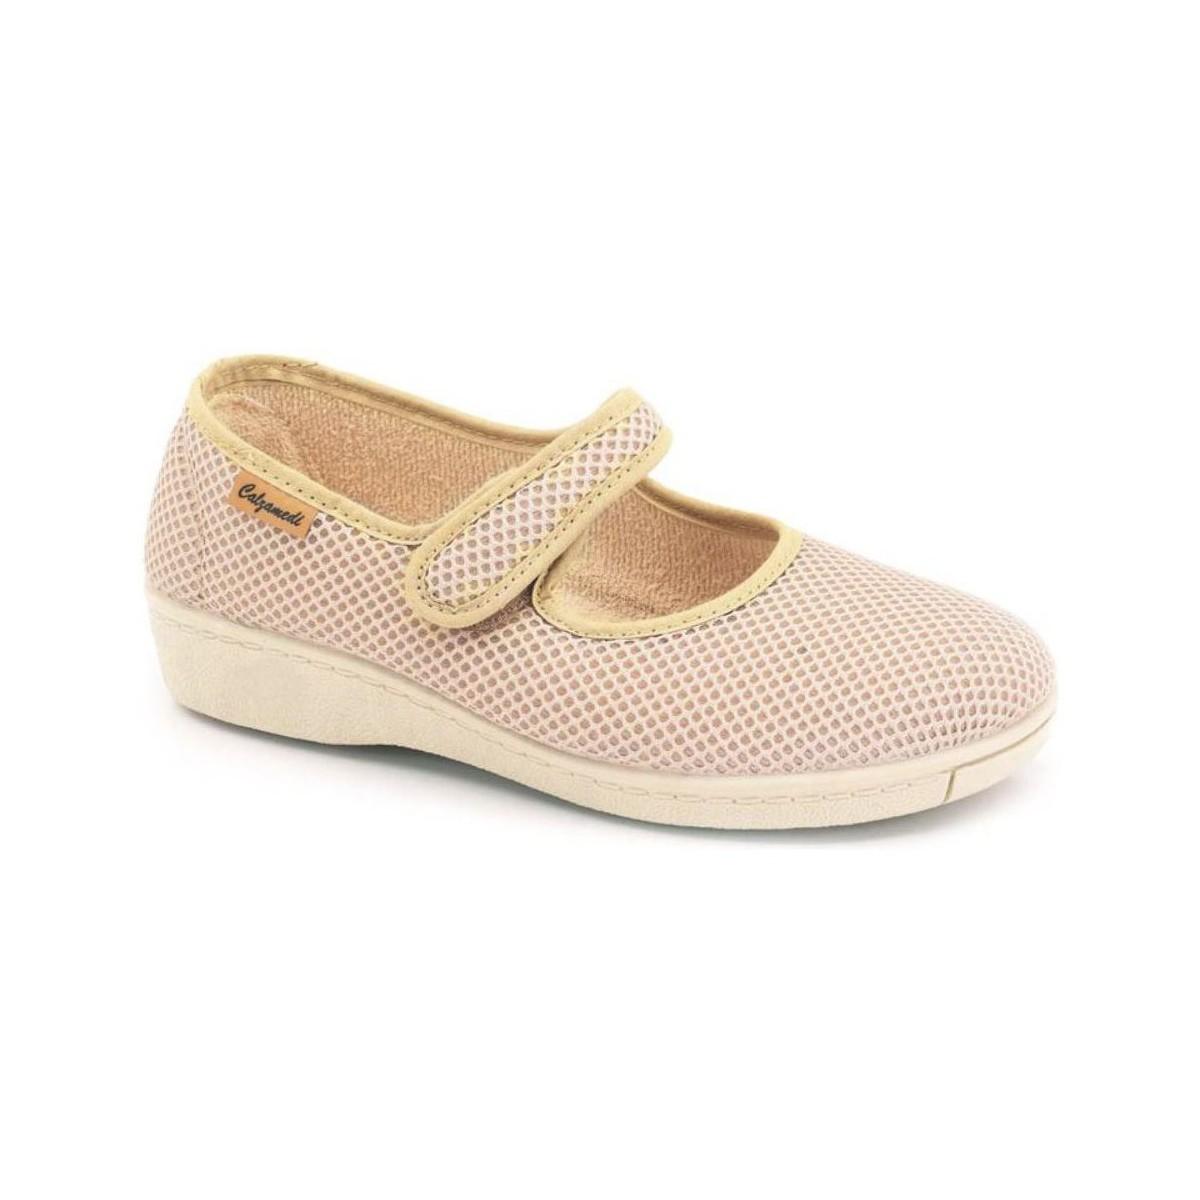 ballerines calzamedi danseurs de semelles orthop diques beige chaussures femme 44 90. Black Bedroom Furniture Sets. Home Design Ideas